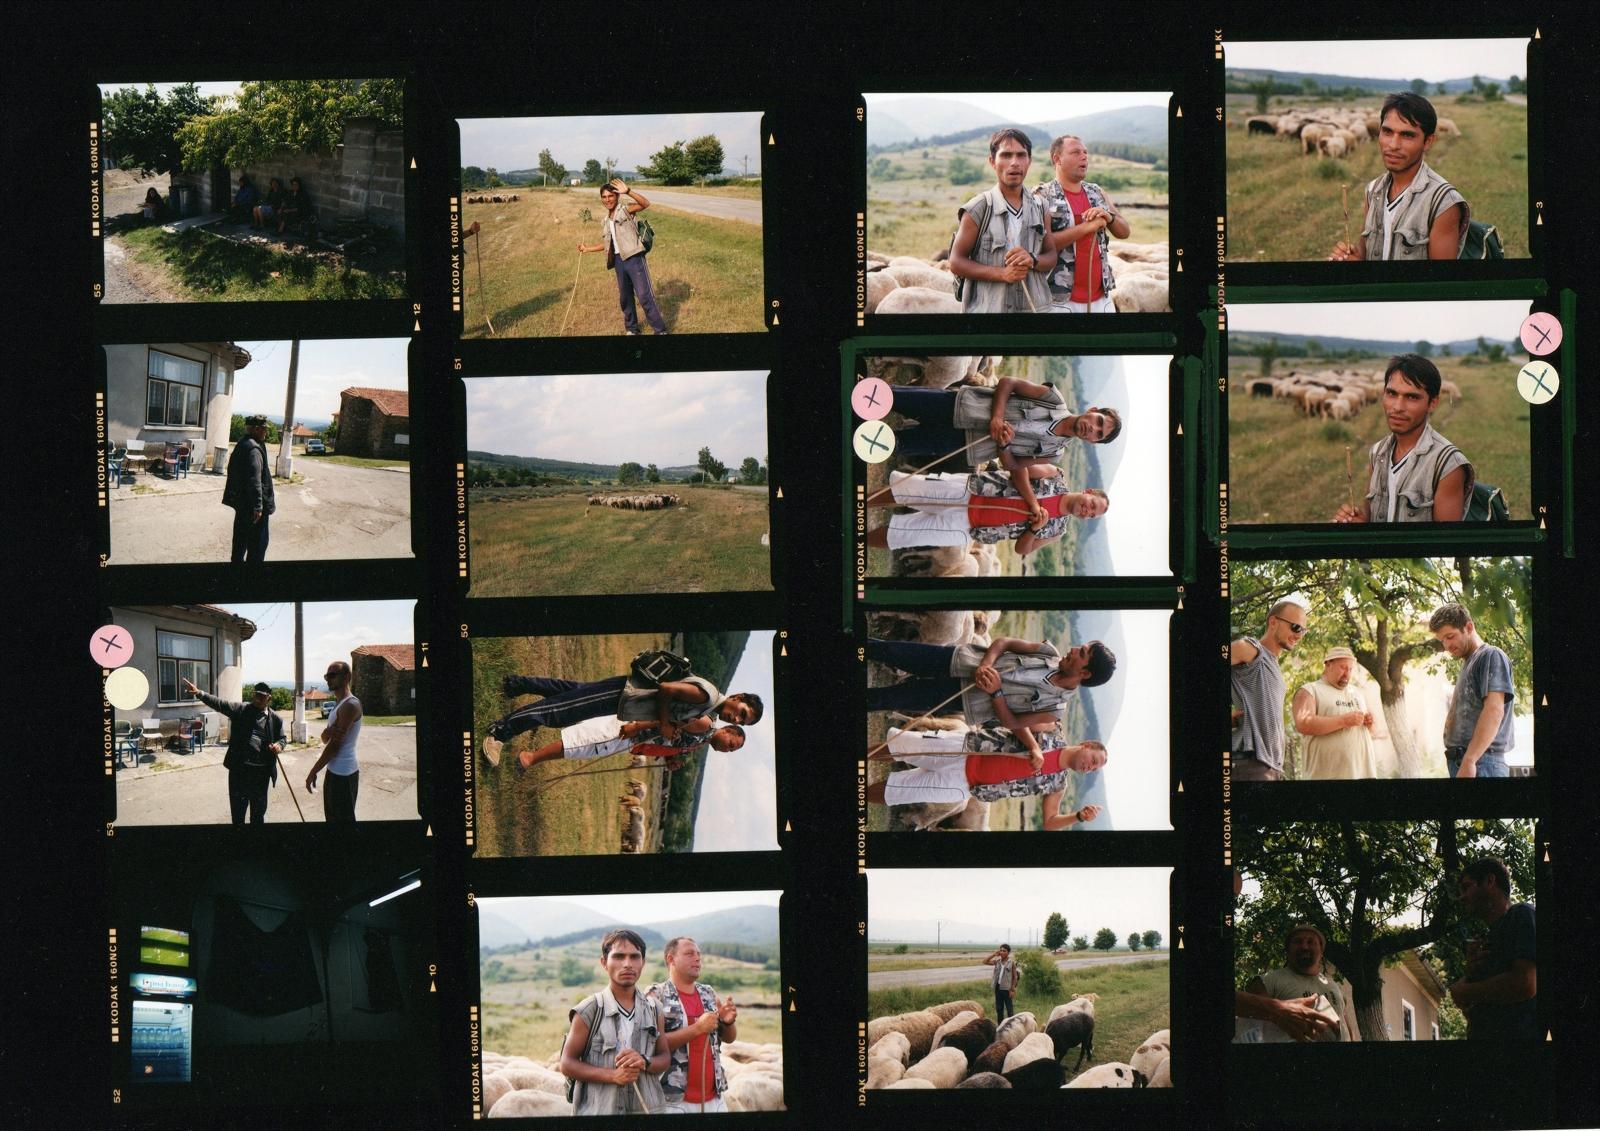 Auf dem Weg - Bulgarien - Full